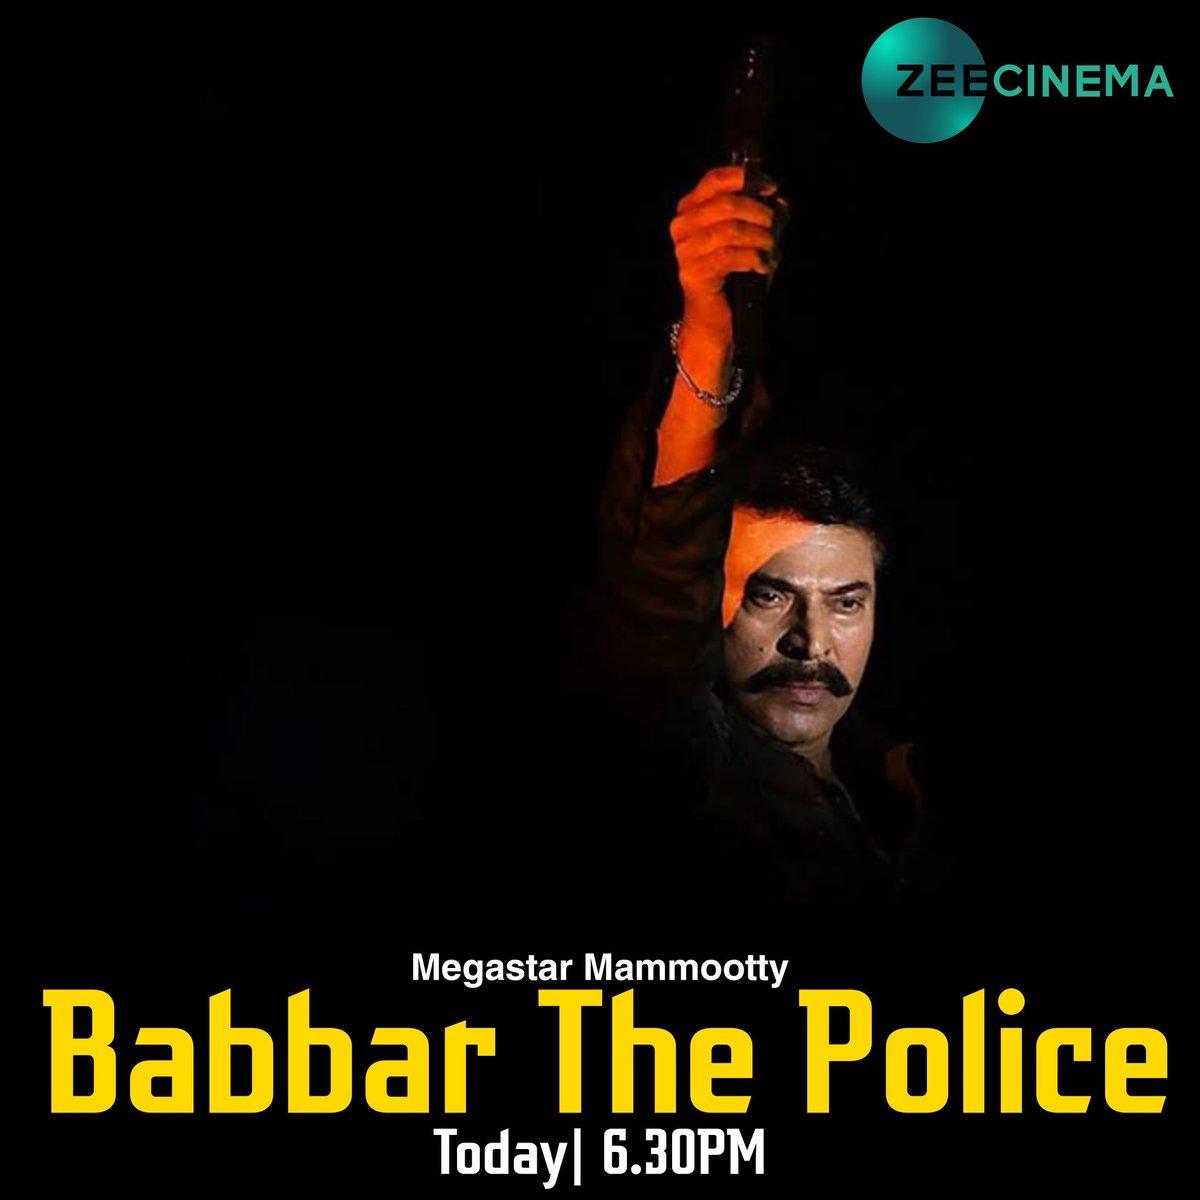 World Television Premiere  #BabbarThePolice ( Abrahaminte Santhathikal ) on #ZeeCinema Today at 6.30pm...  Megastar #Mammootty  #Mammukka  #AnsonPaul #Kaniha  #OneTheMovie #ThePriest #BabbarThePoliceOnZeeCinema #ThePriestTeaser